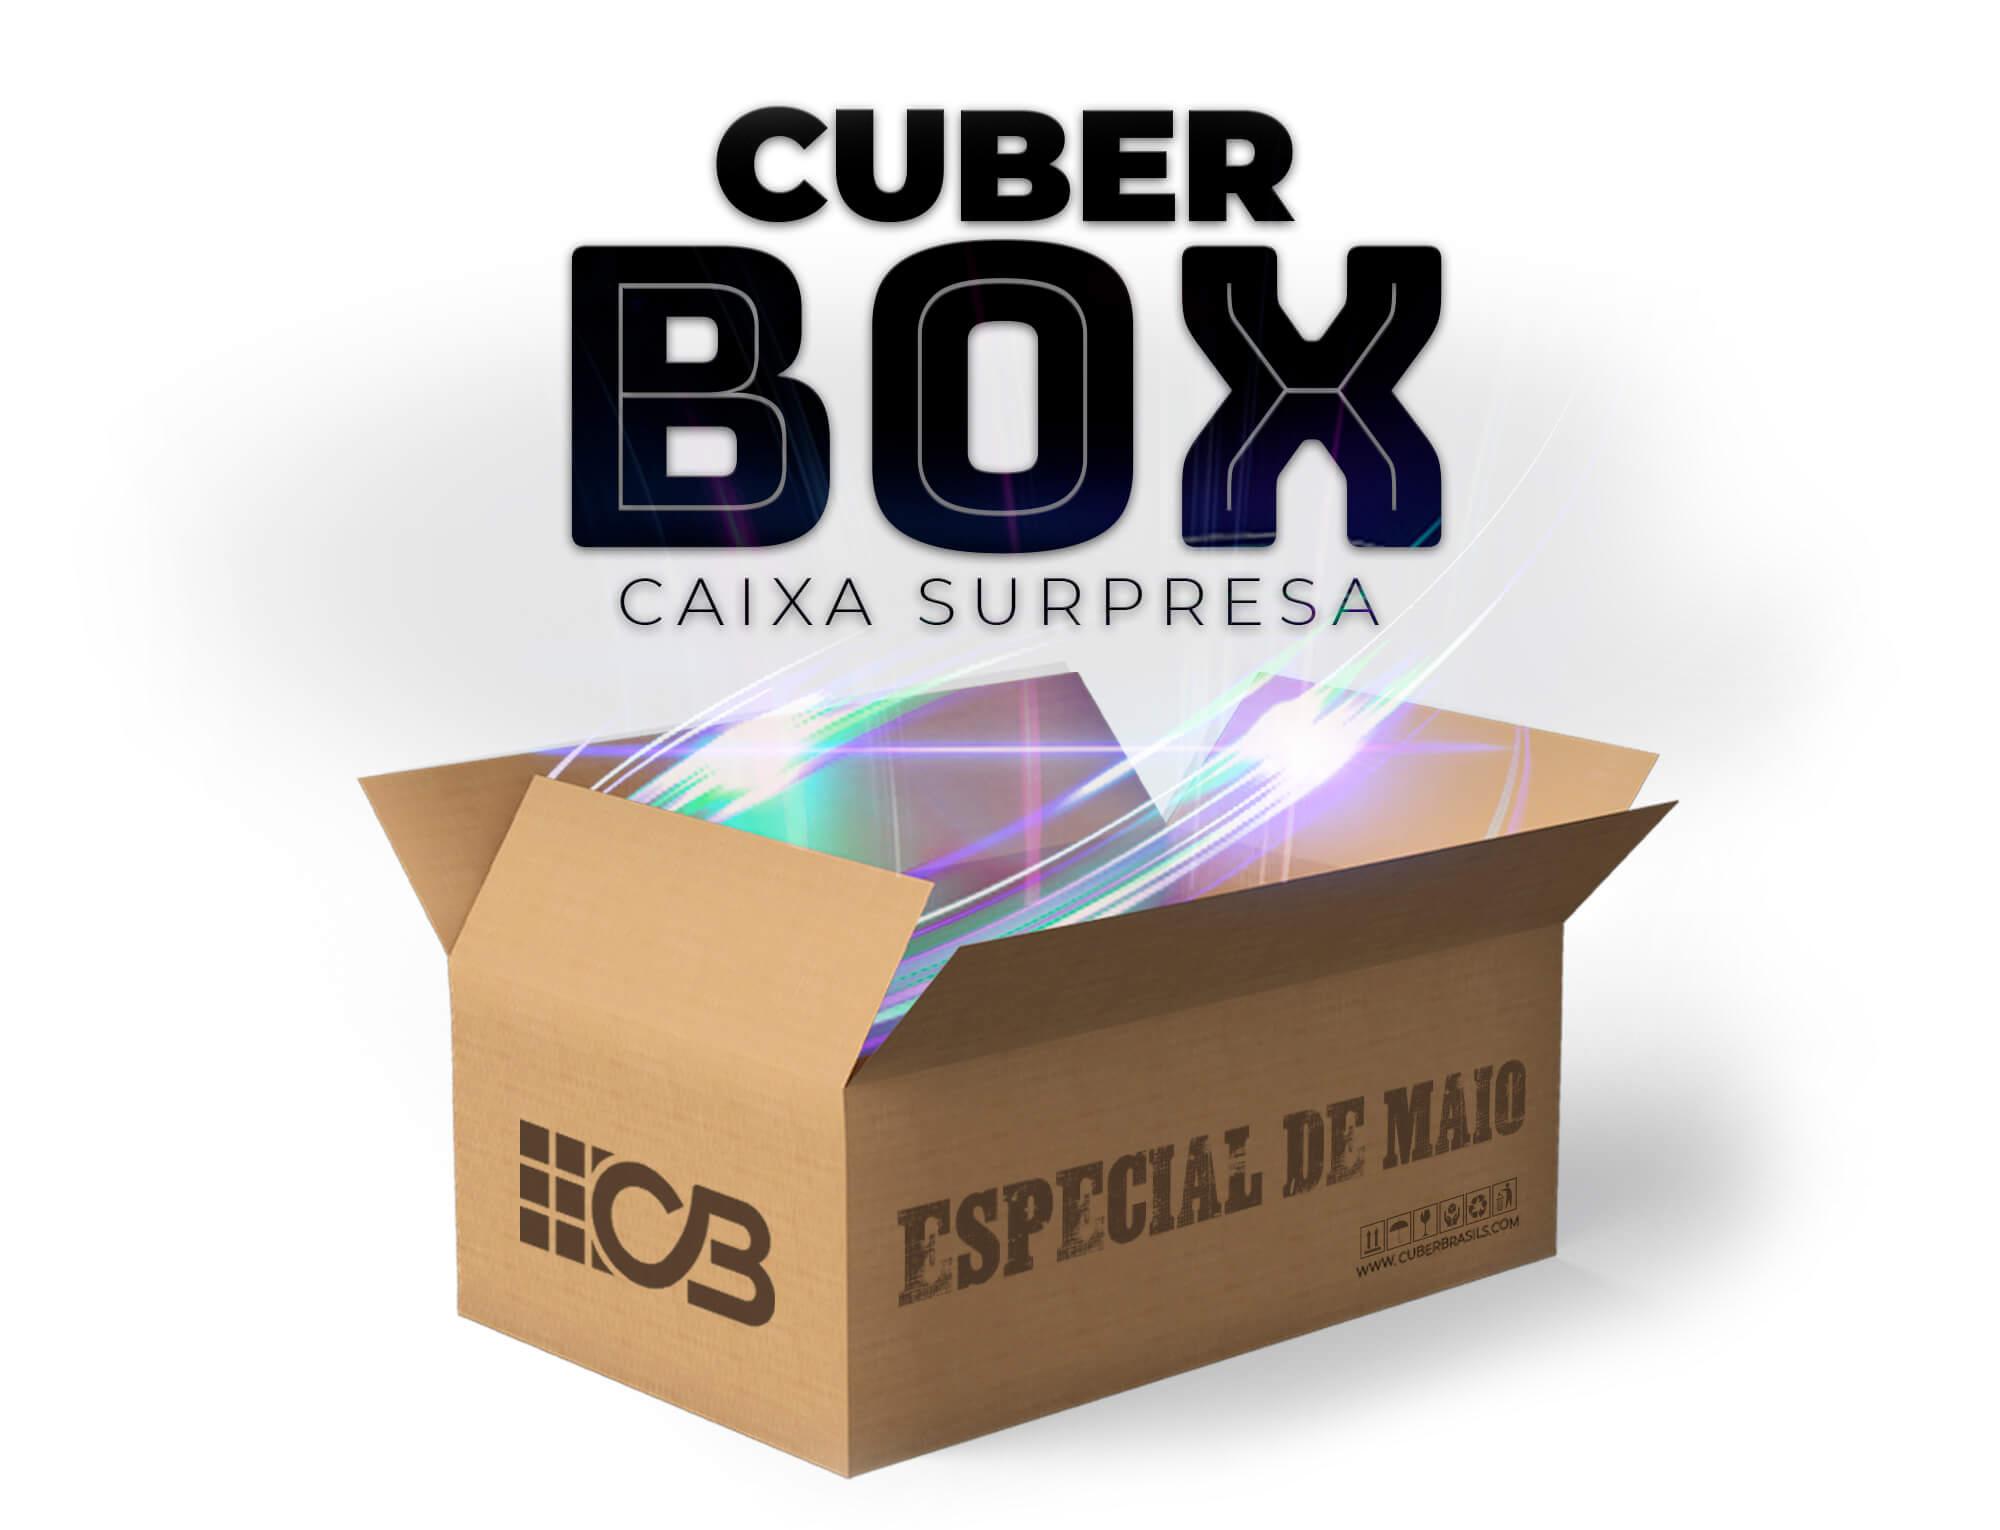 CUBER BOX - CAIXA SURPRESA MAIO